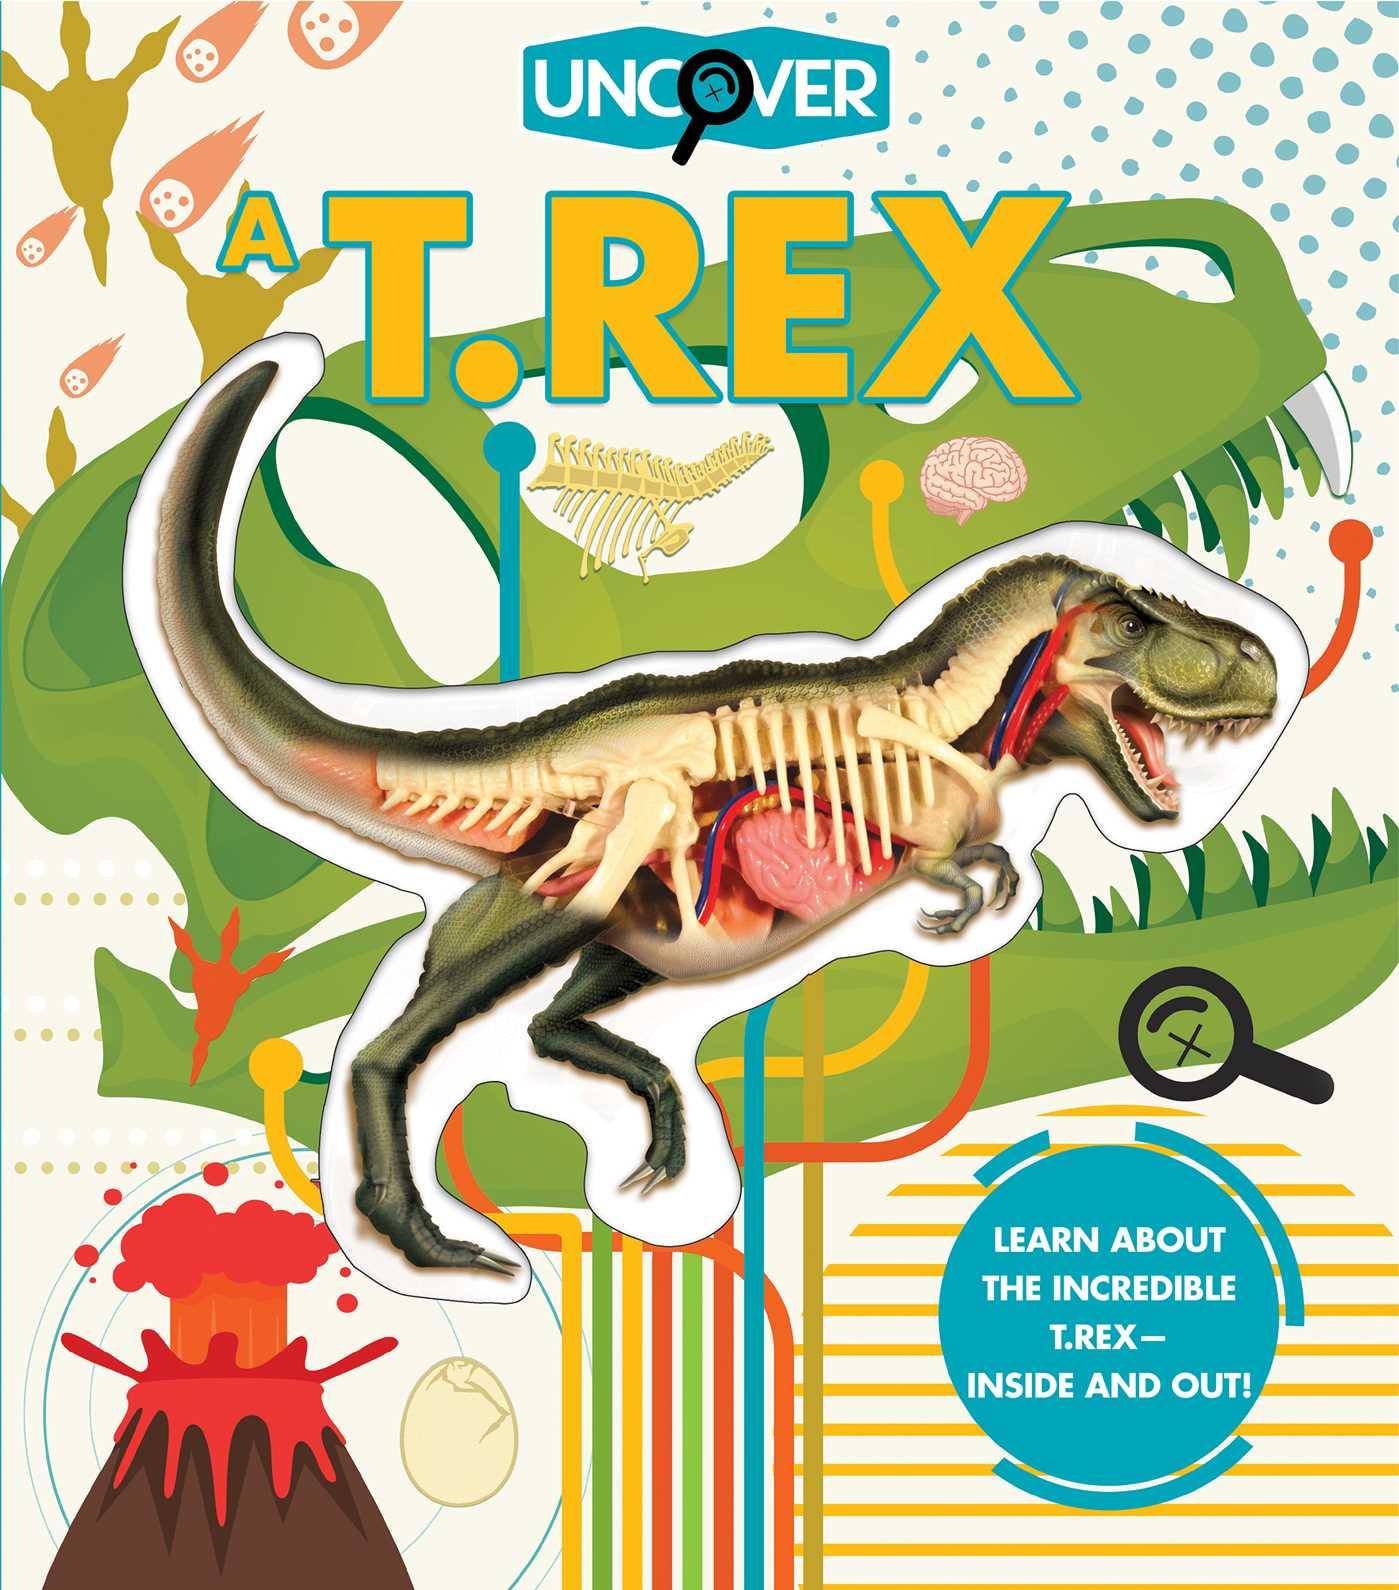 Uncover a t rex 9781684125517 hr